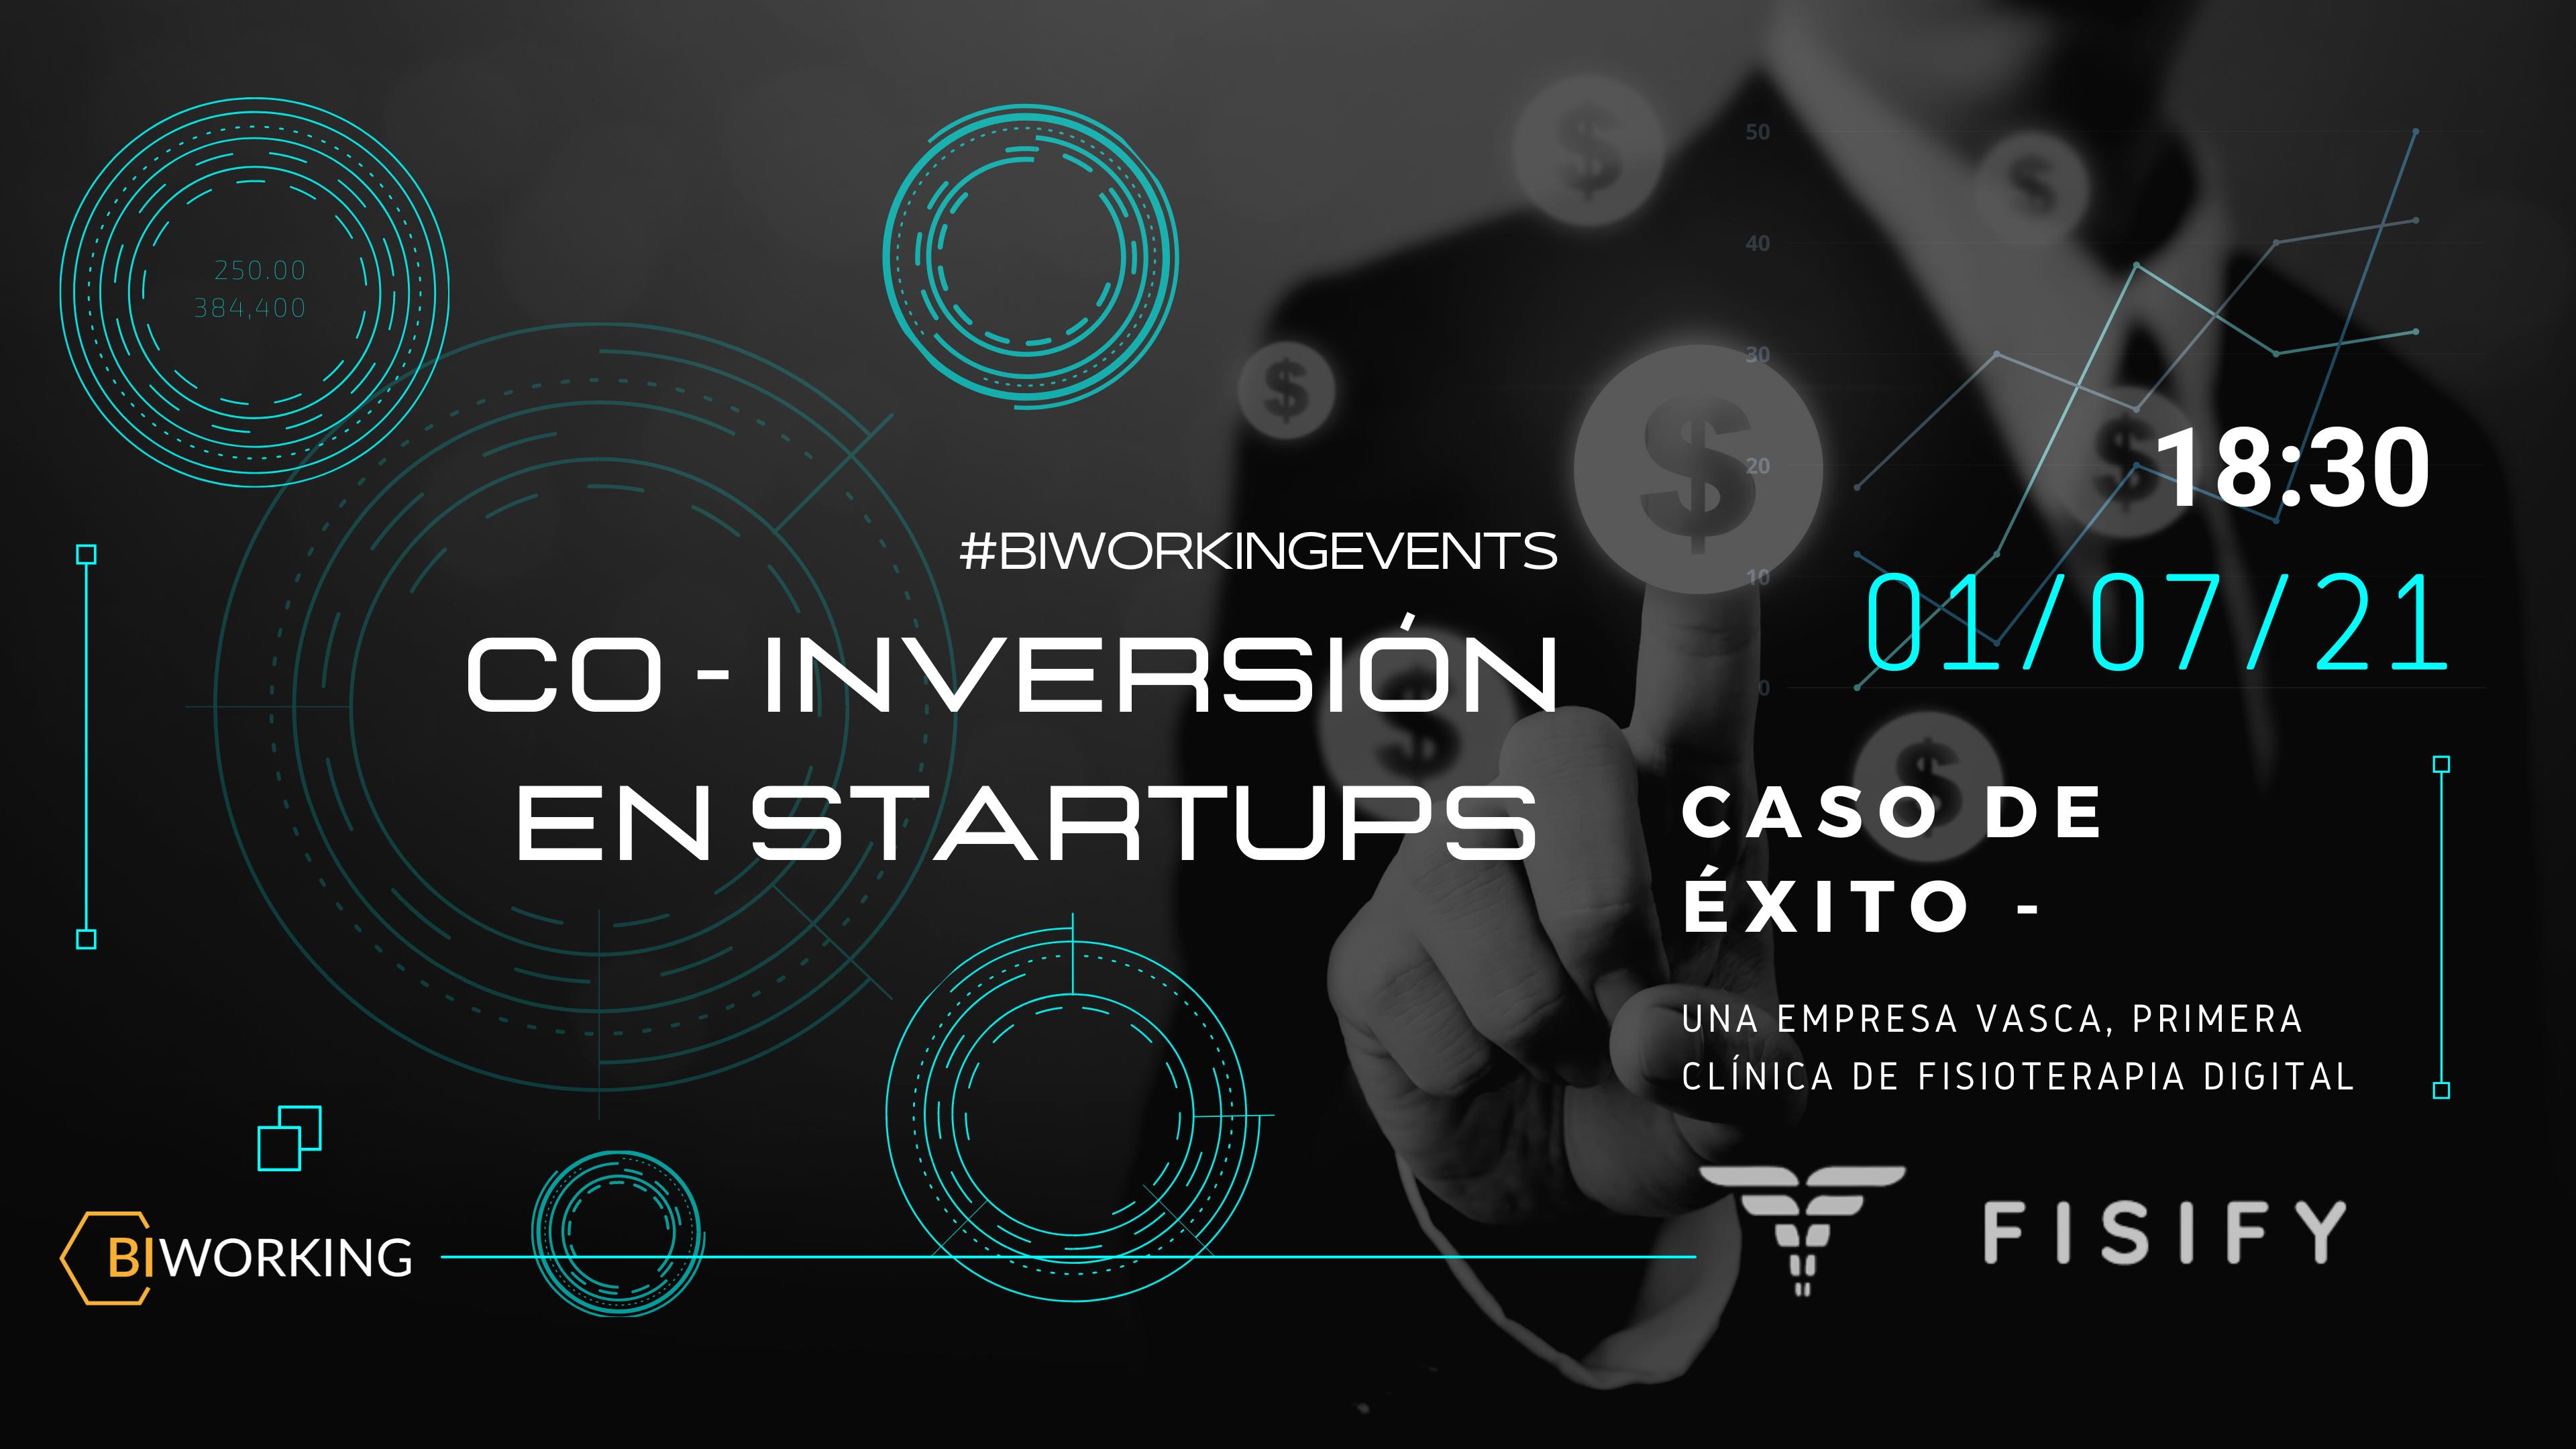 coinvesion-startups-biworking-fisify-bilbao-empresas